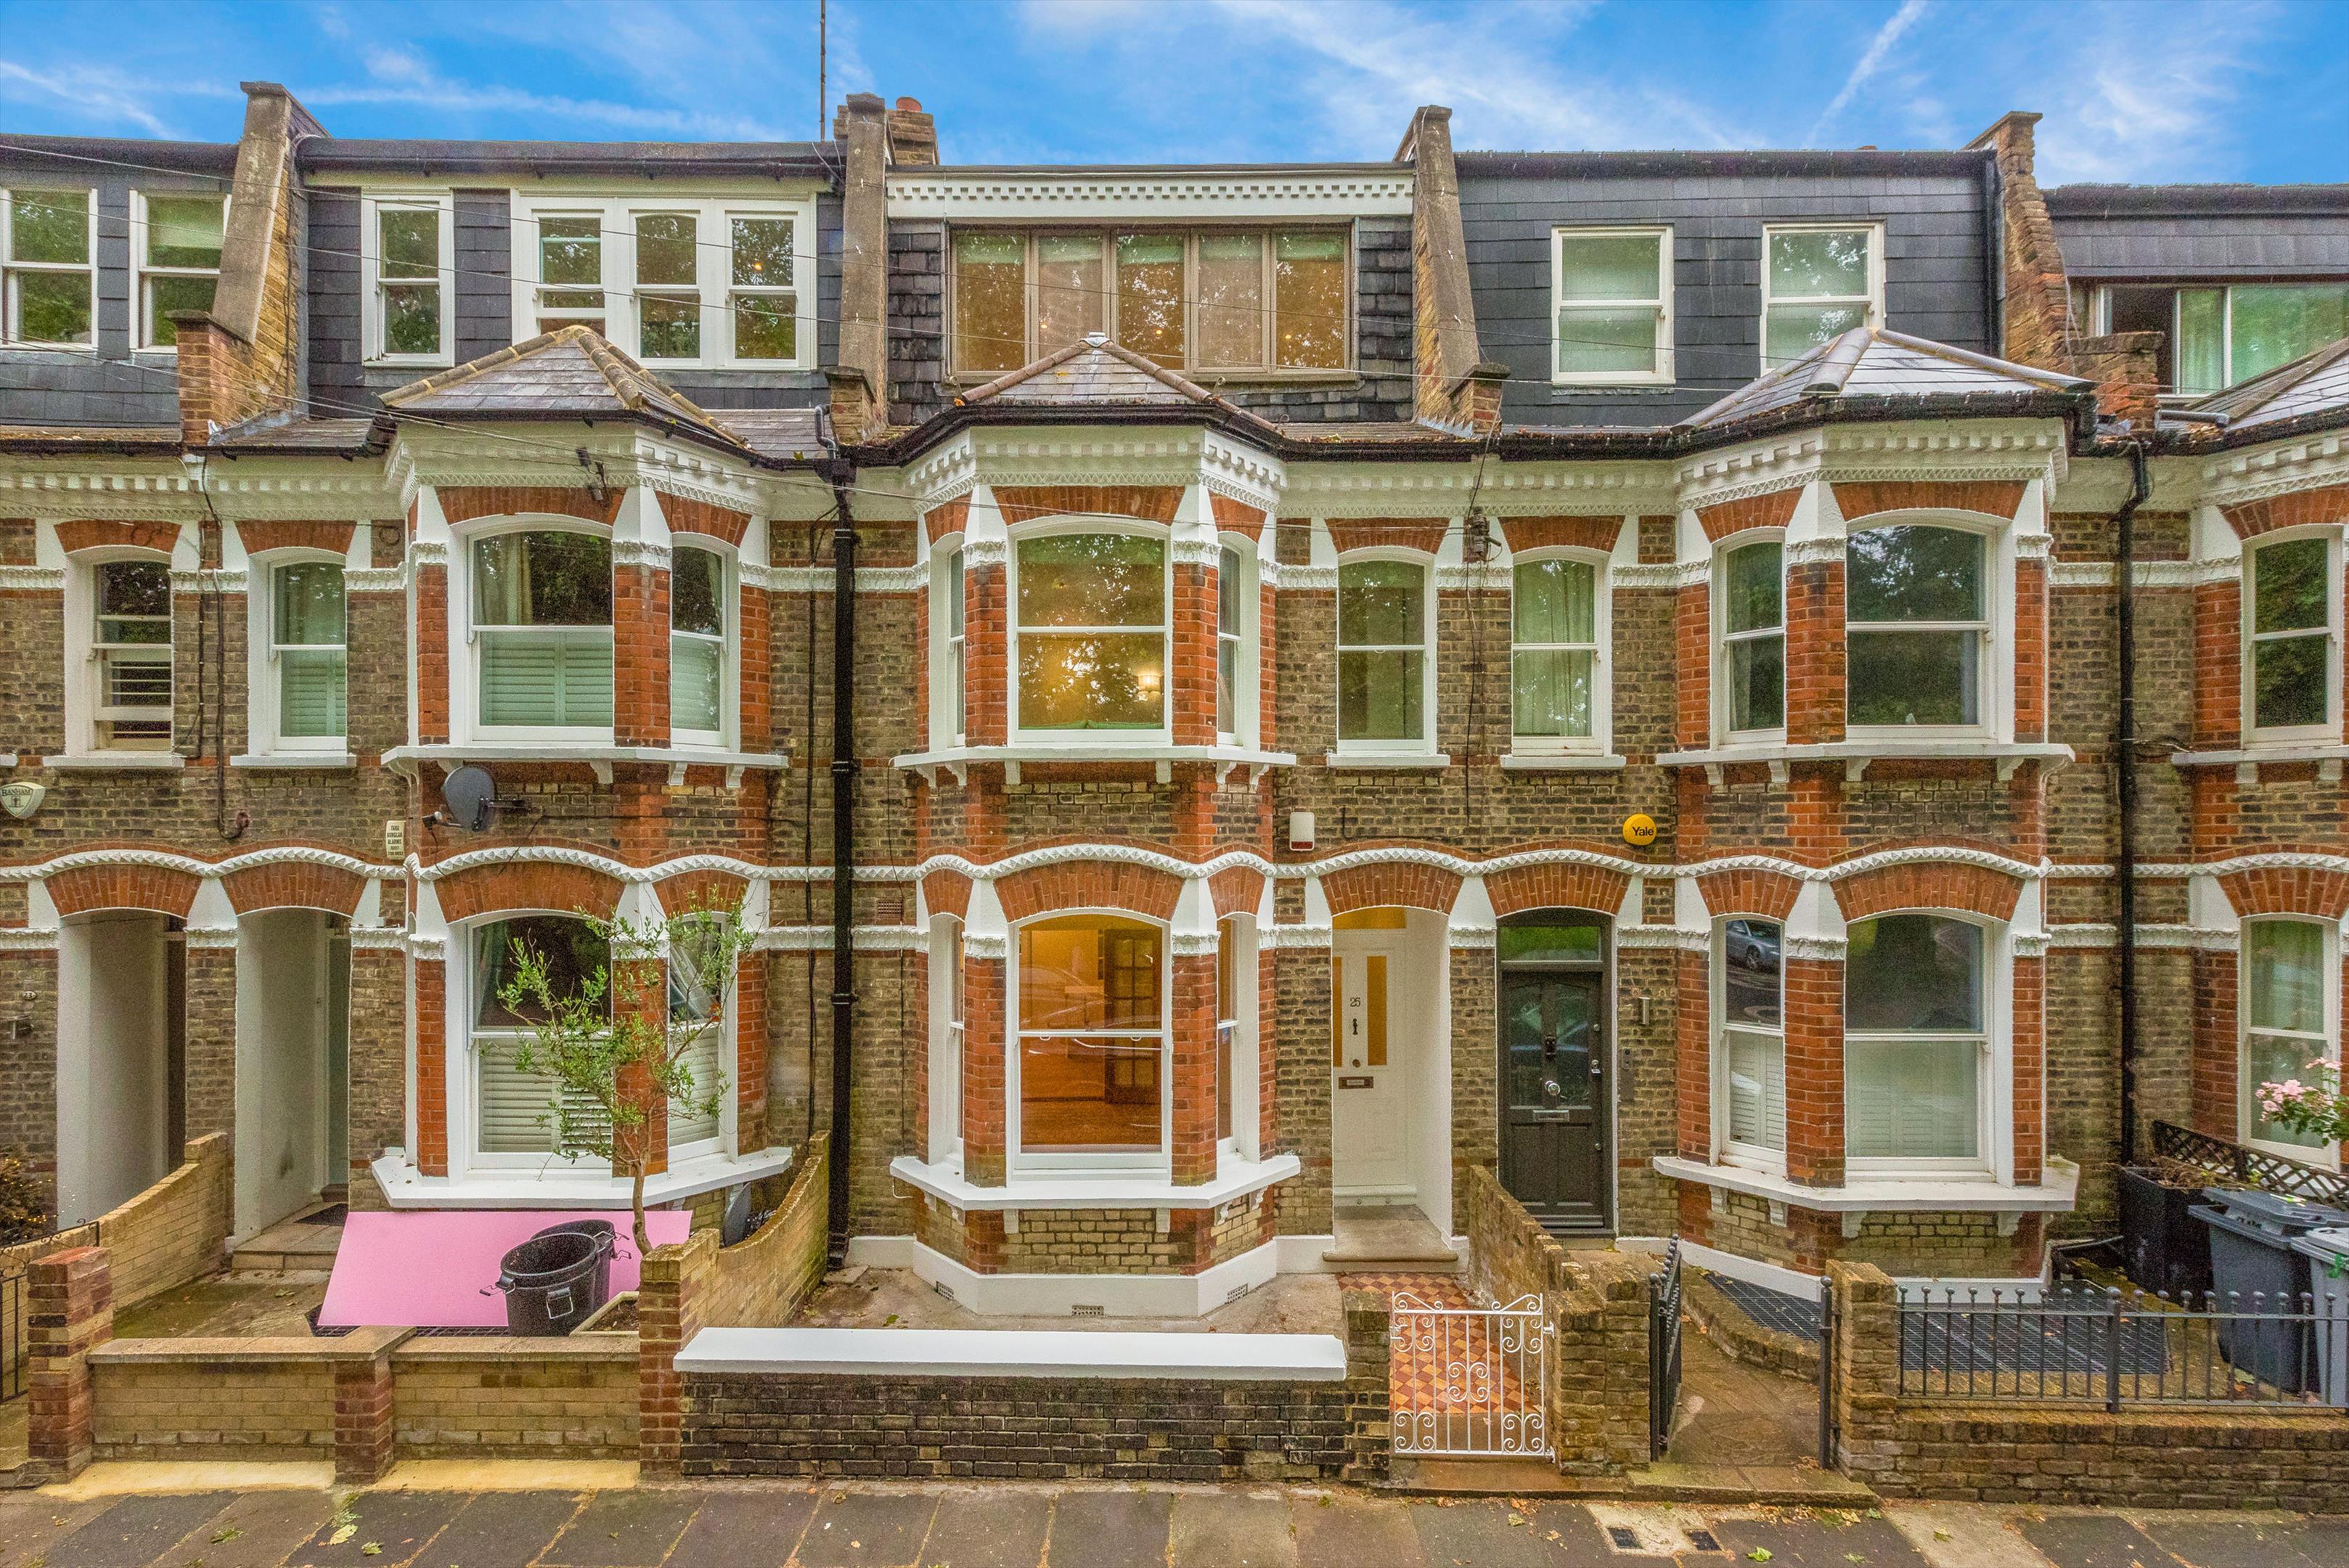 Favart Rd, London SW6, UK - Source: Knight Frank